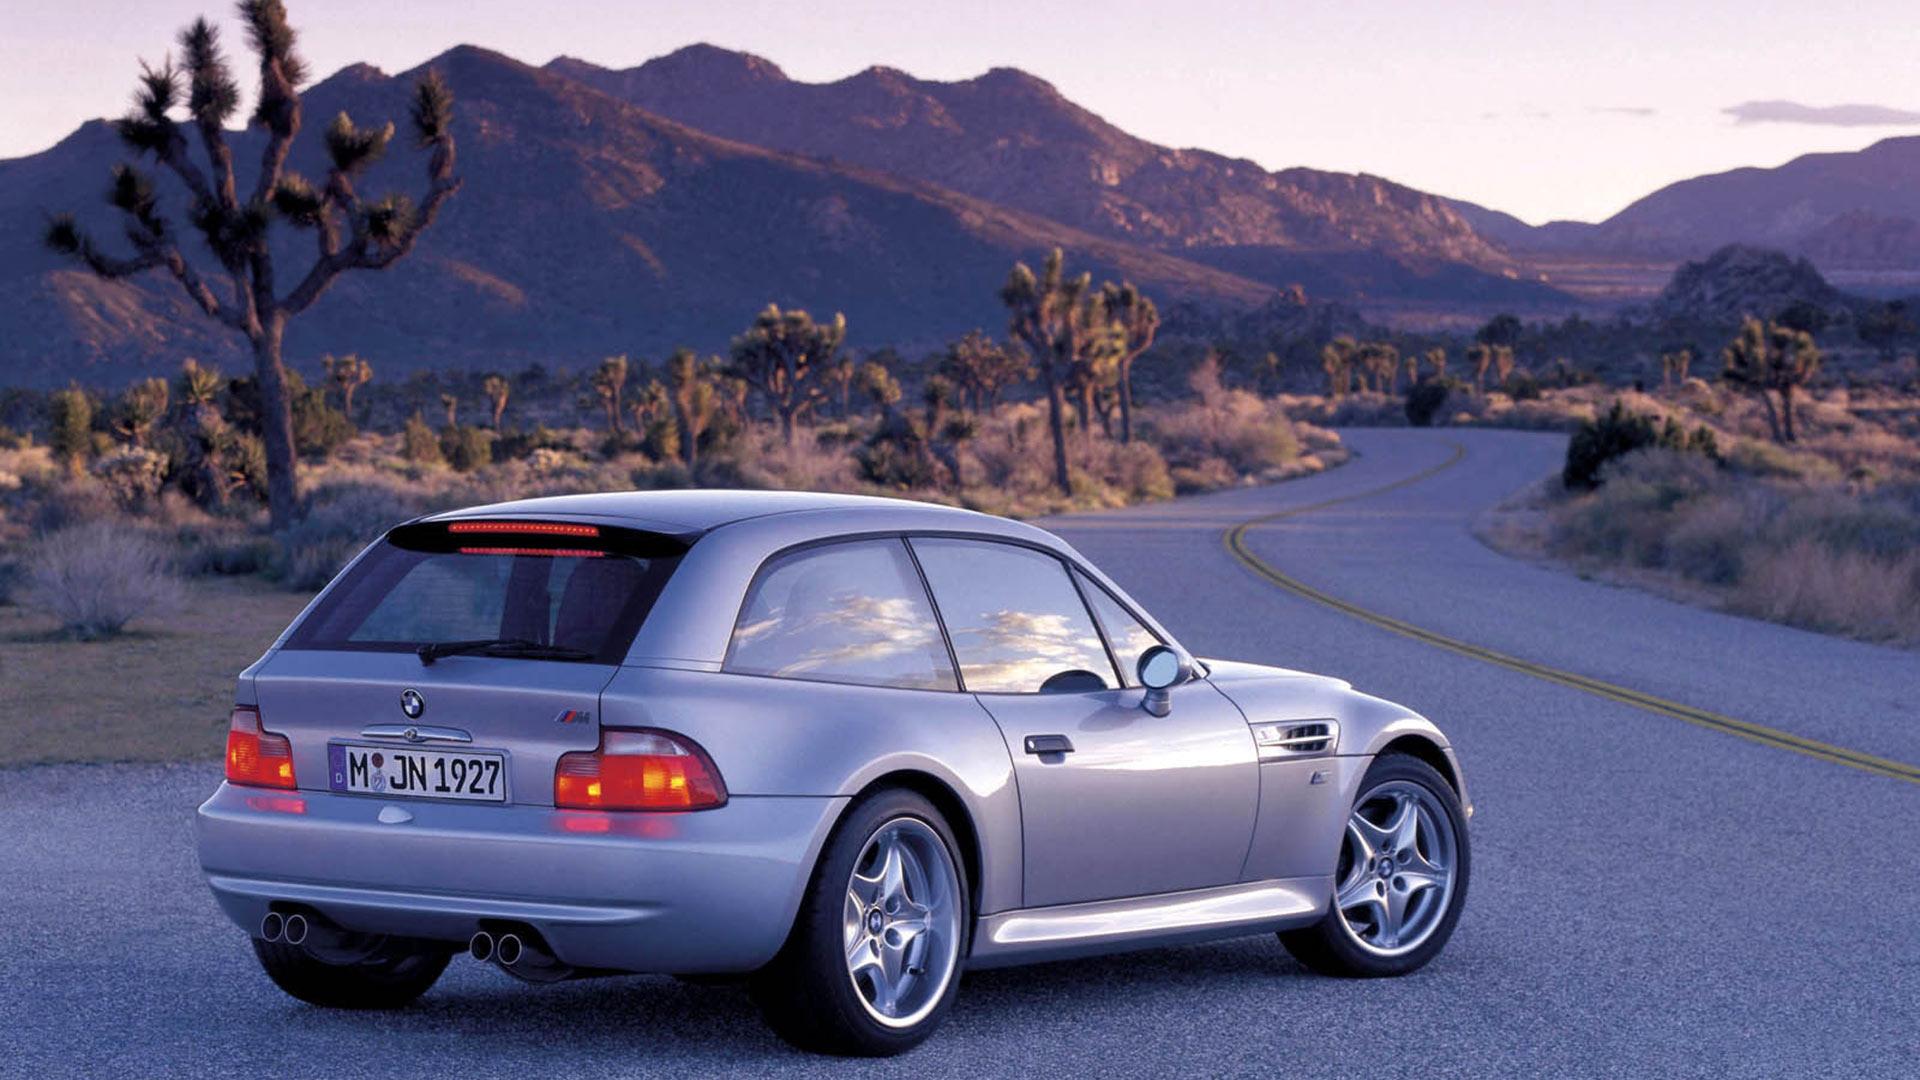 1998 E36 BMW Z3 Coupe